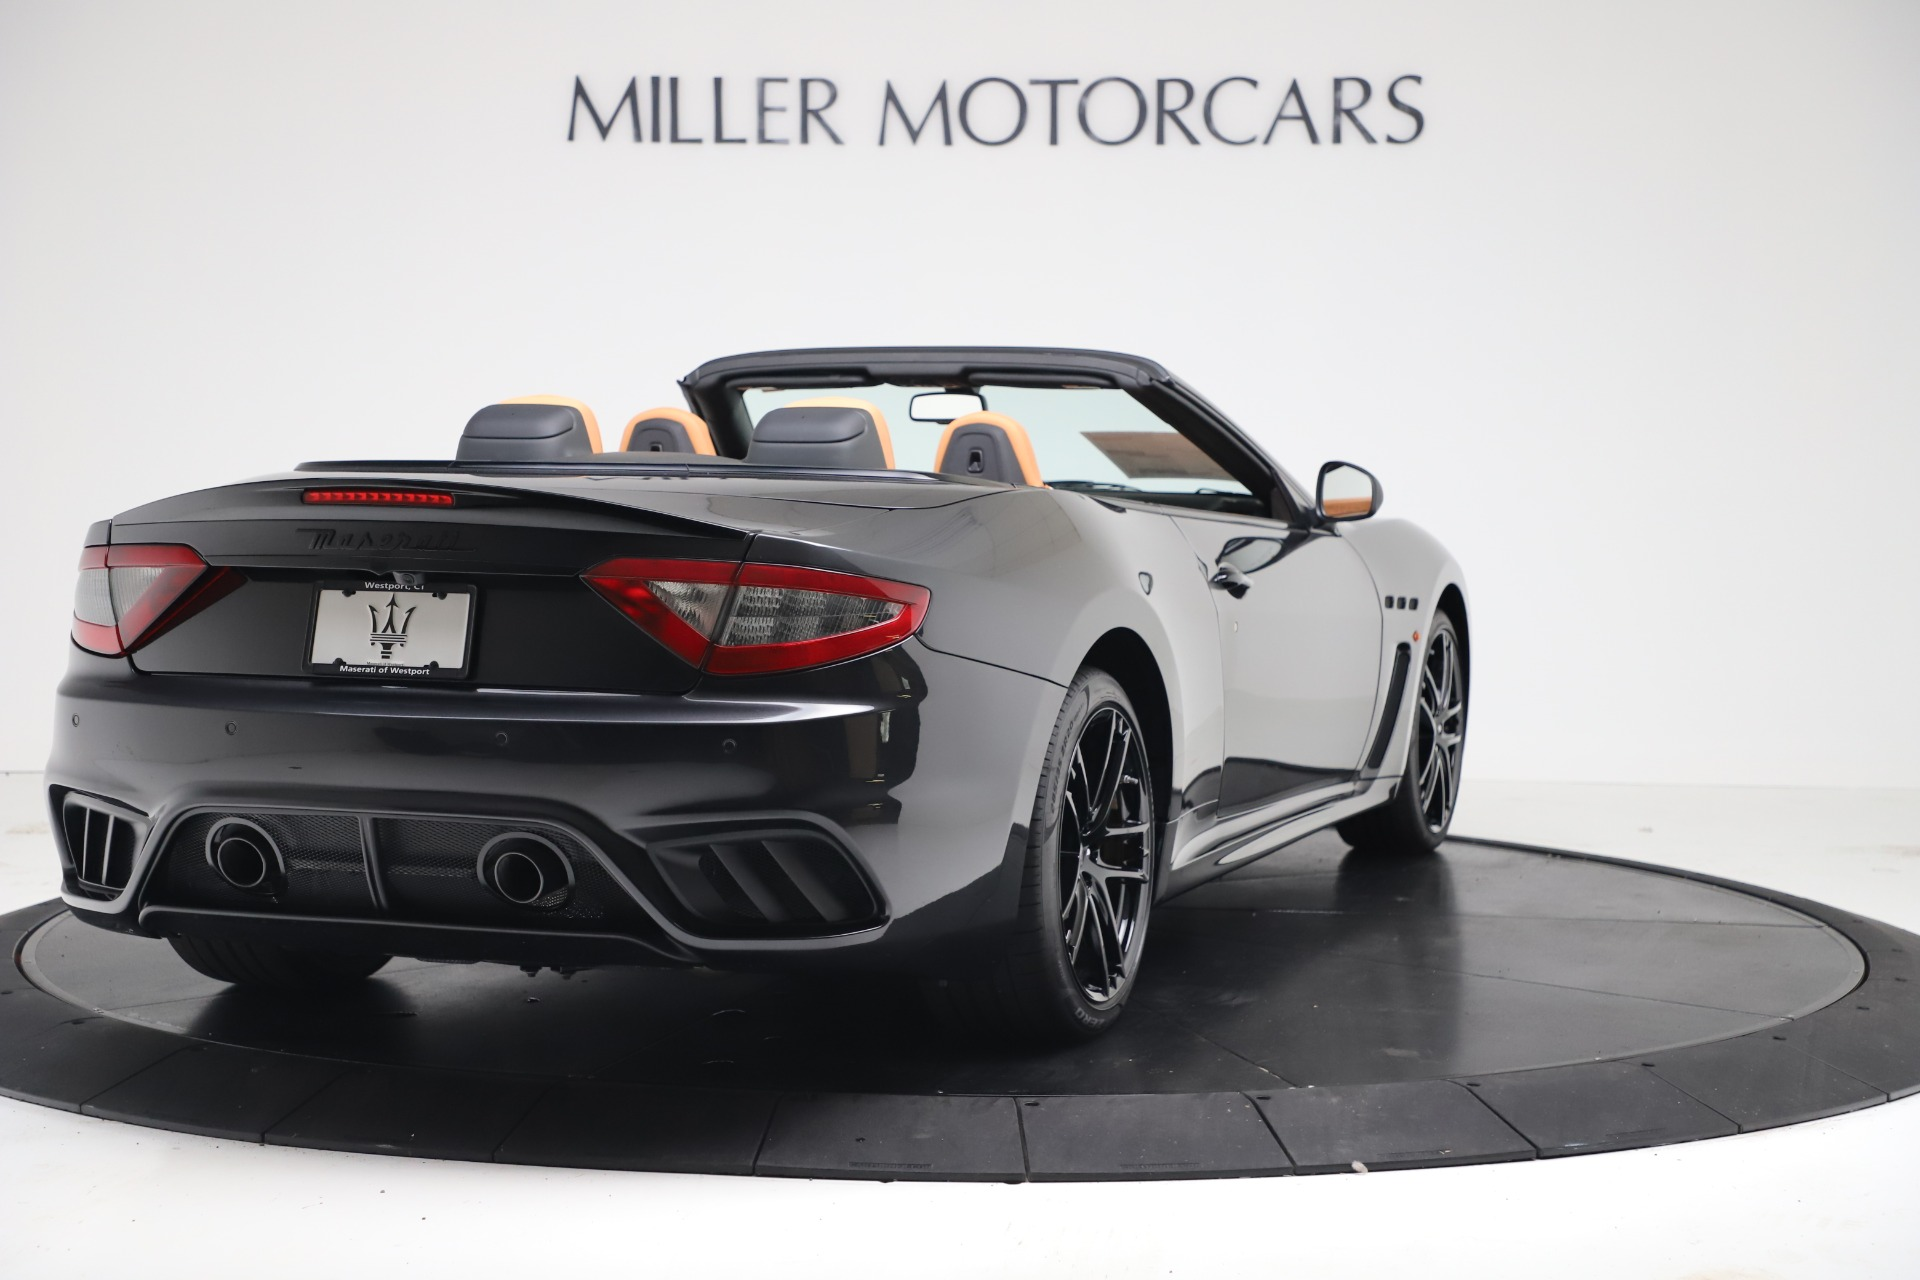 New 2019 Maserati GranTurismo MC Convertible For Sale In Westport, CT 3468_p7